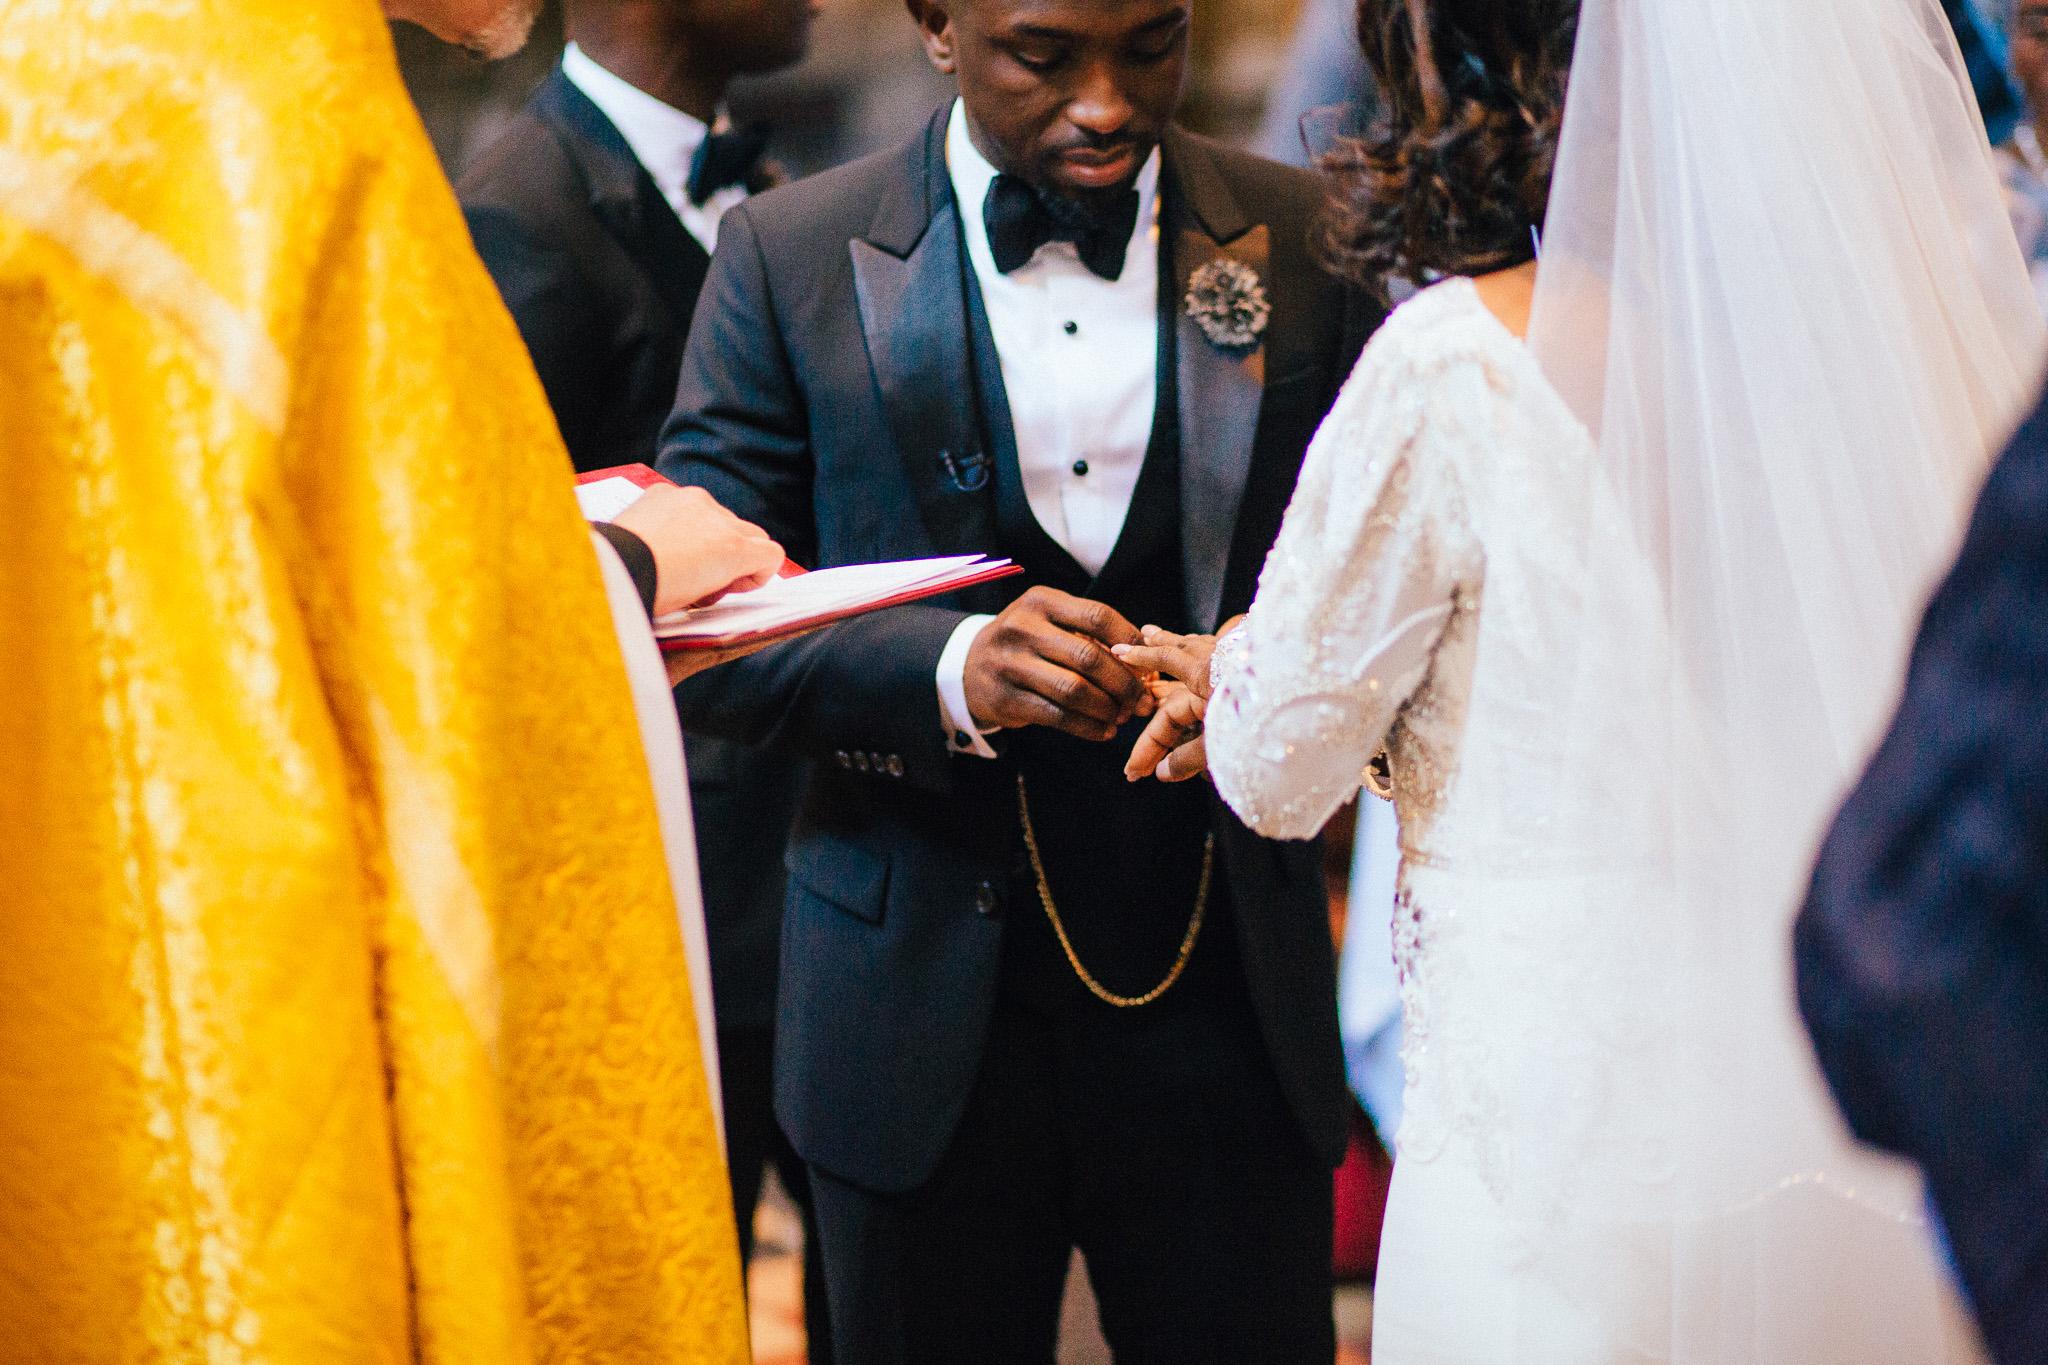 london-wedding-photographer-nigerian-montecalm-stbartholemew-plaisterers-61.jpg